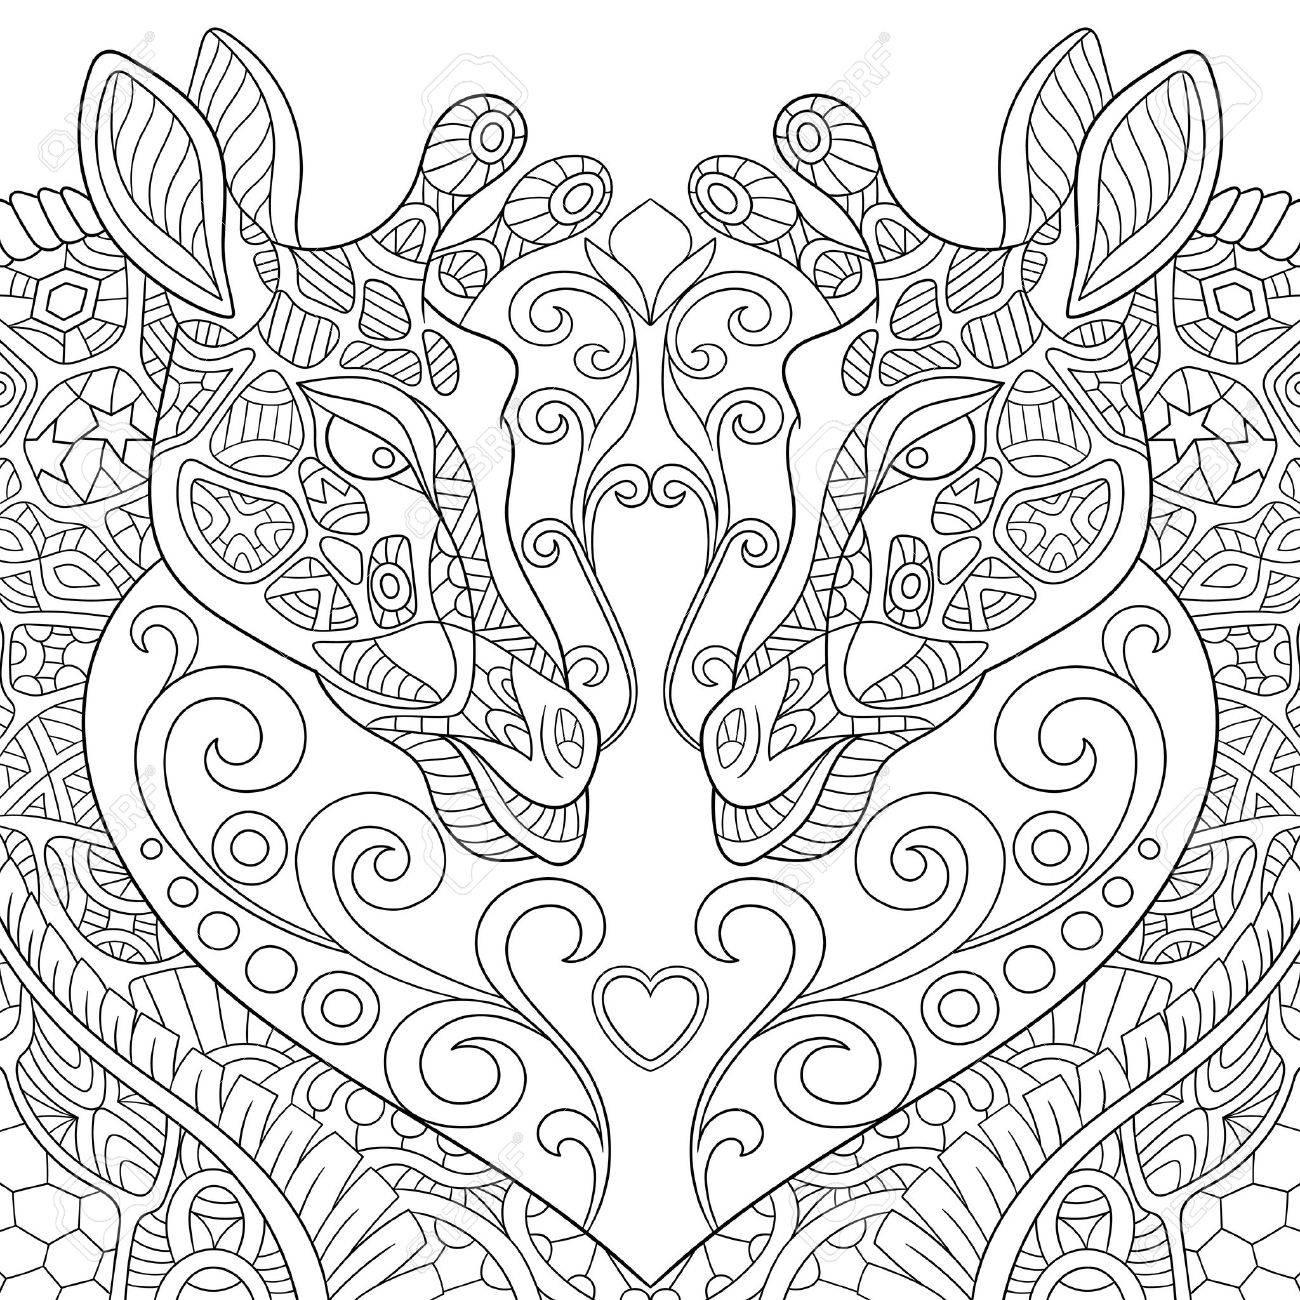 coloriage anti stress girafe